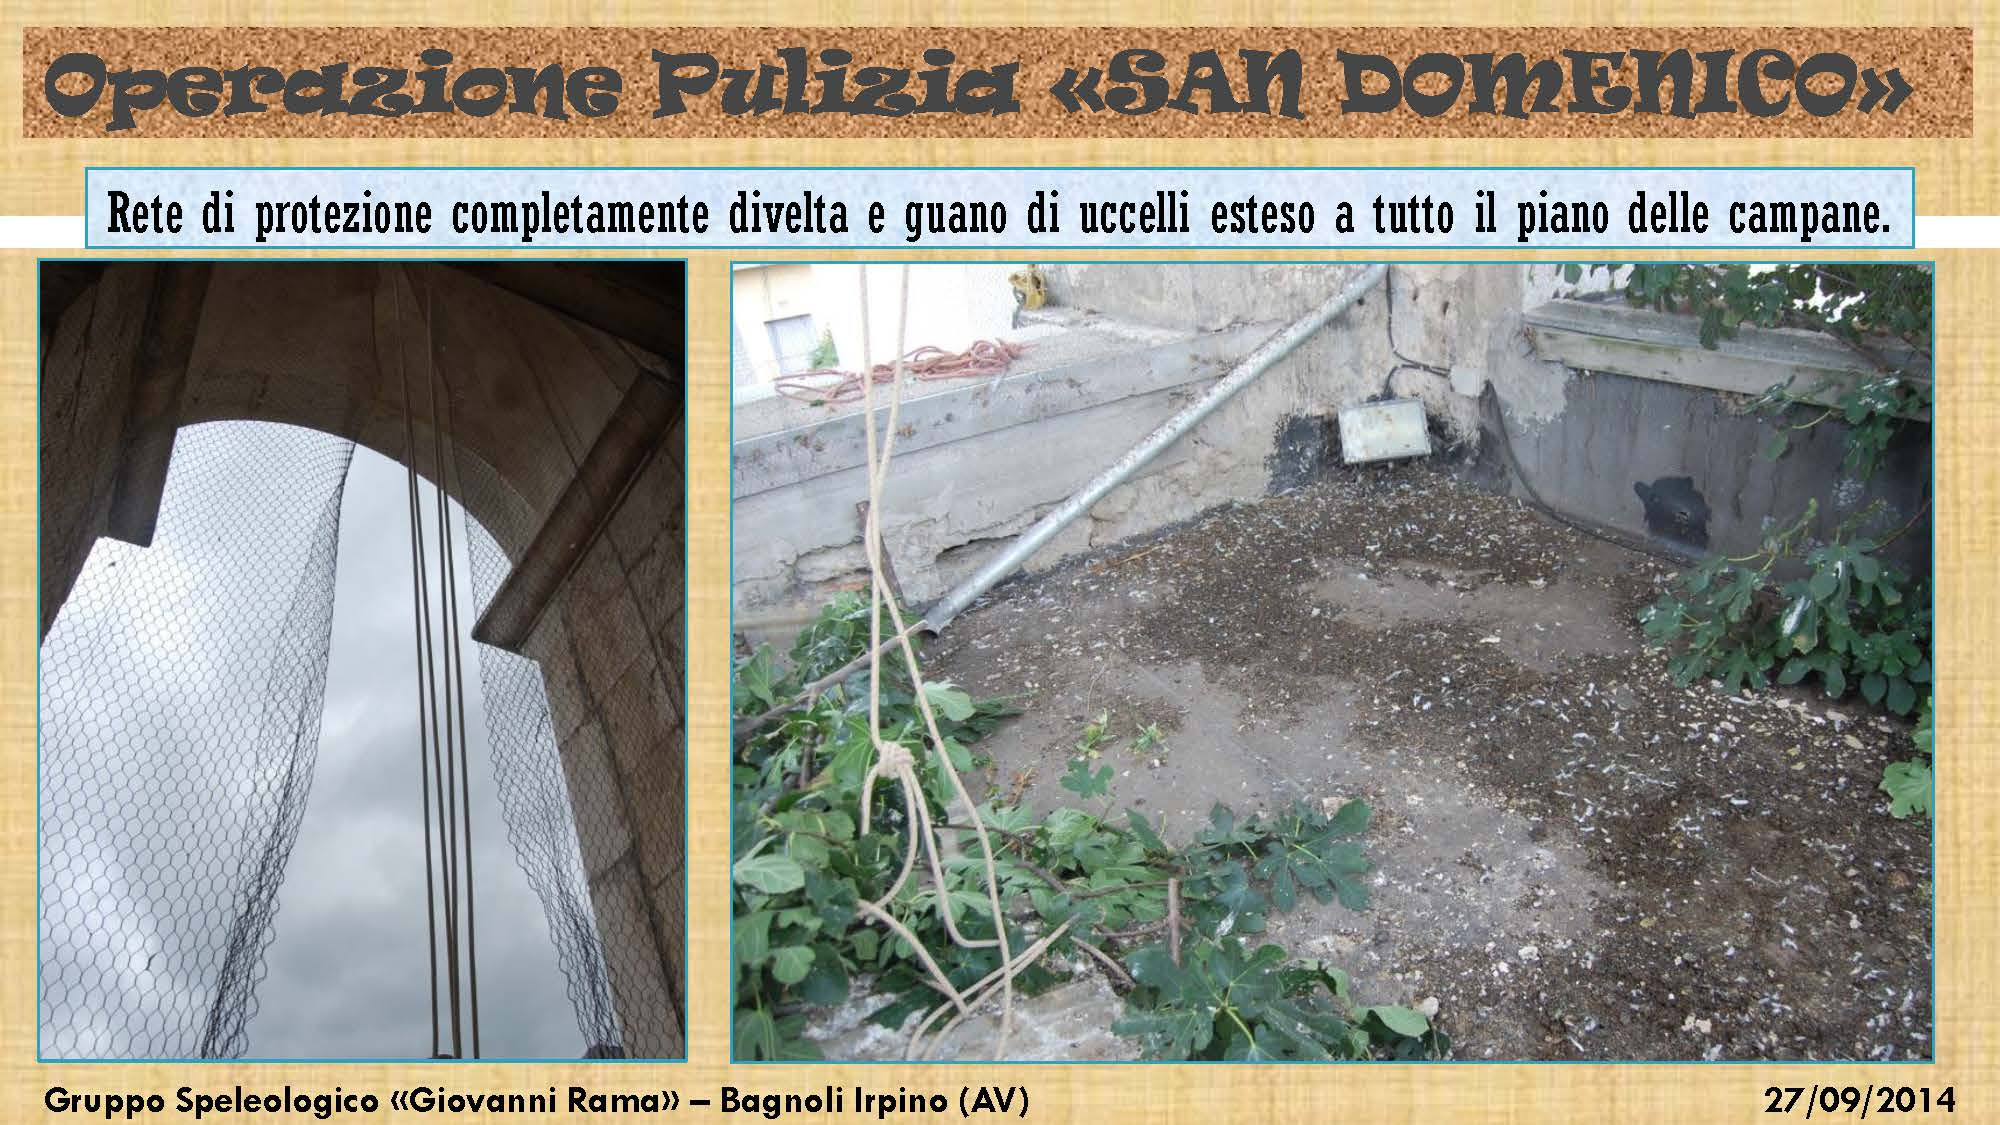 Bagnoli-Pulizia-San-Domenico-2014_Pagina_22